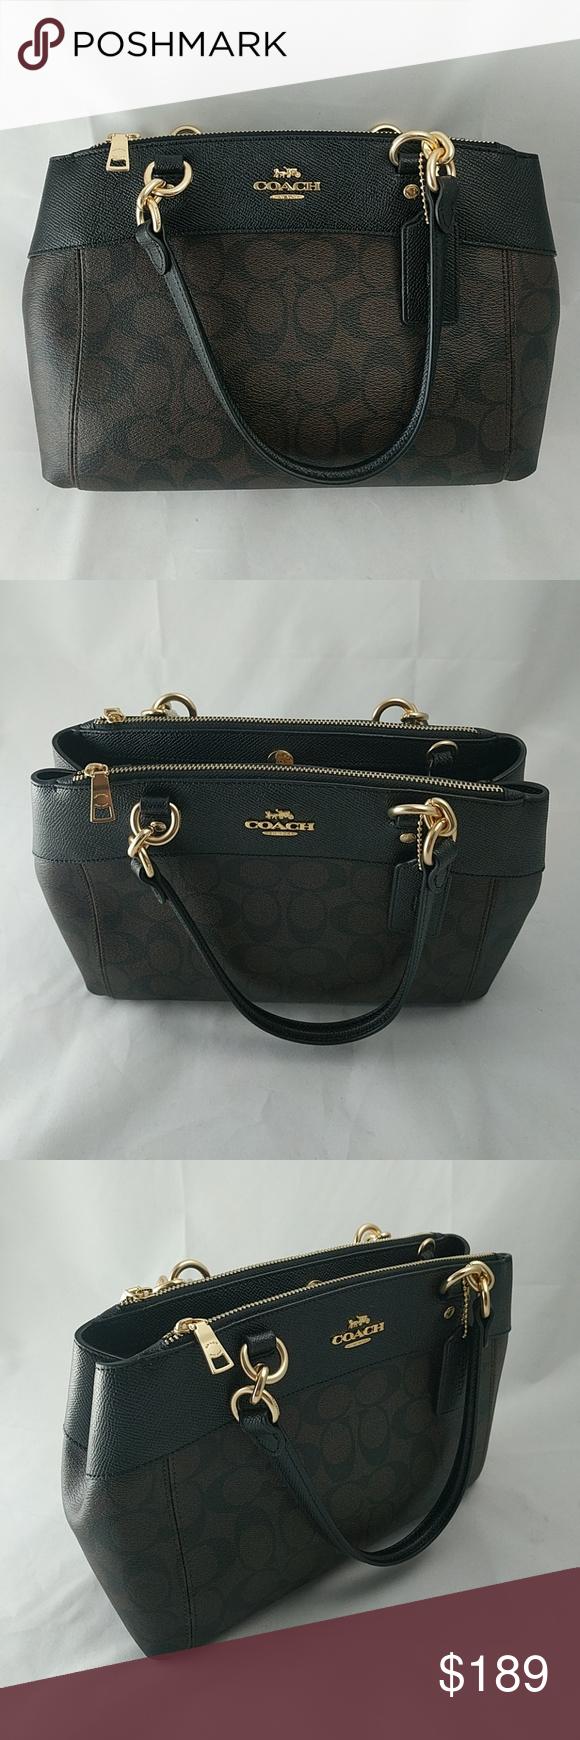 236123f853f Coach Signature Mini Brooke Carryall Handbag Brand New Coach Women s  Signature Mini Brooke Carryall Handbag. Tags still attached. Never used.